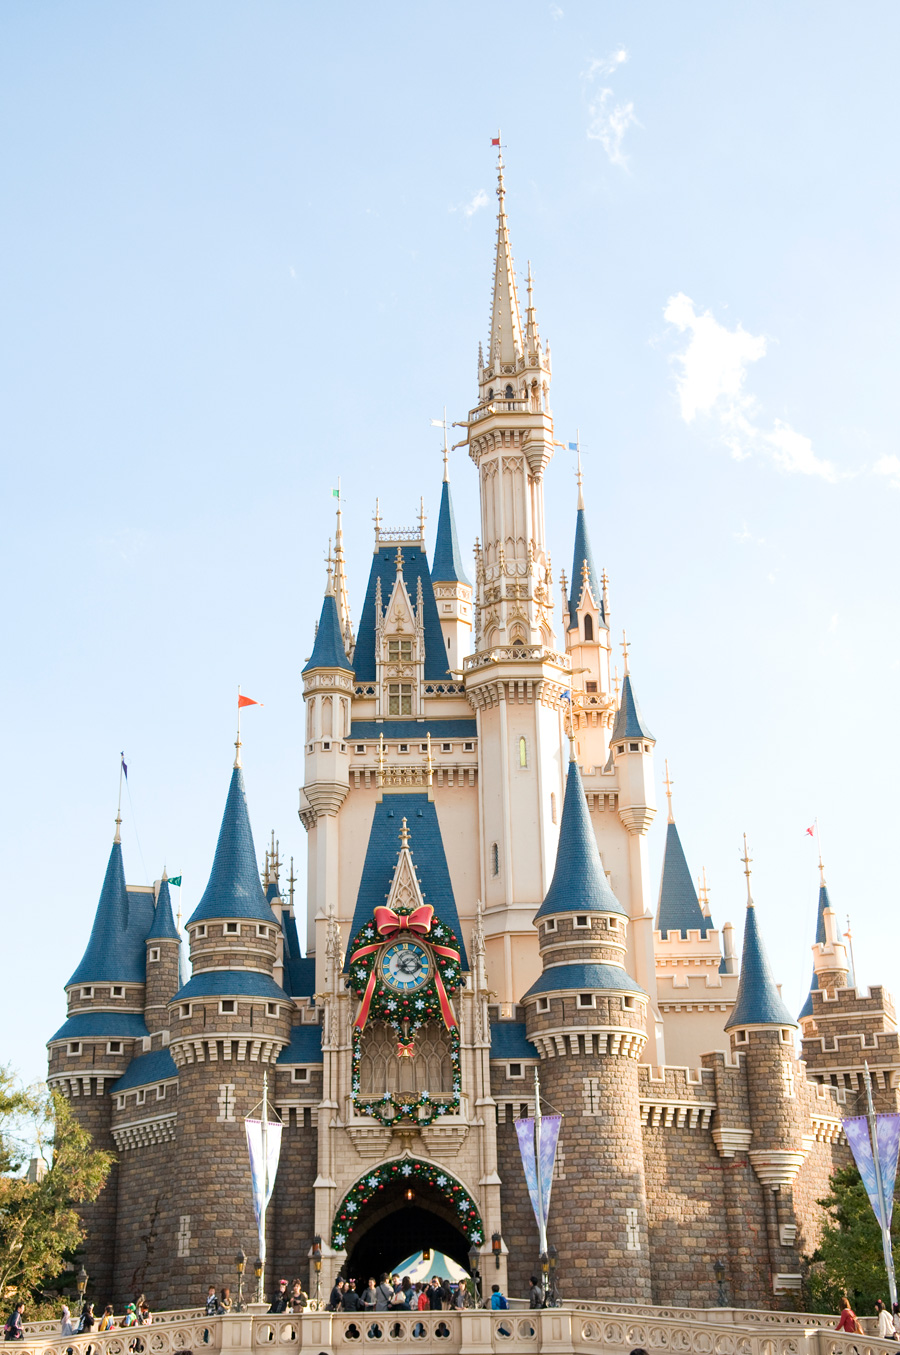 ... of sights you won't see at Disneyland Resort or Walt Disney World